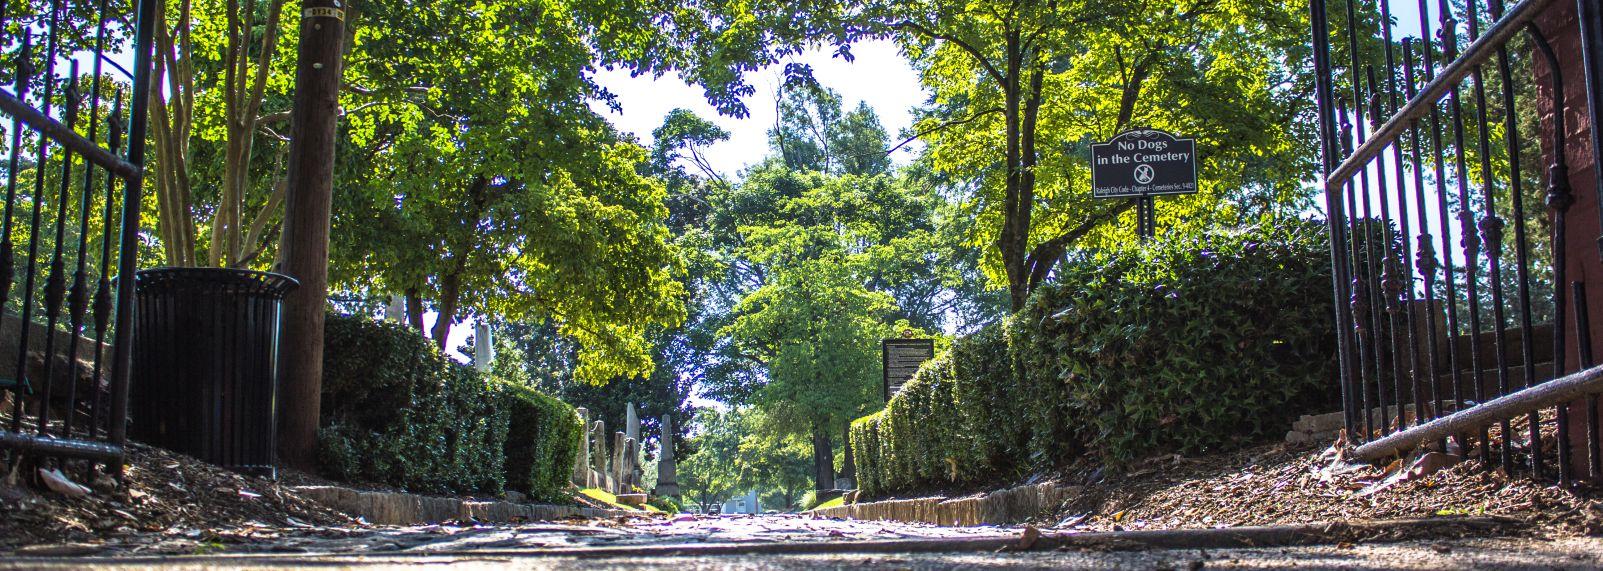 City Cemetery 06-223.jpg